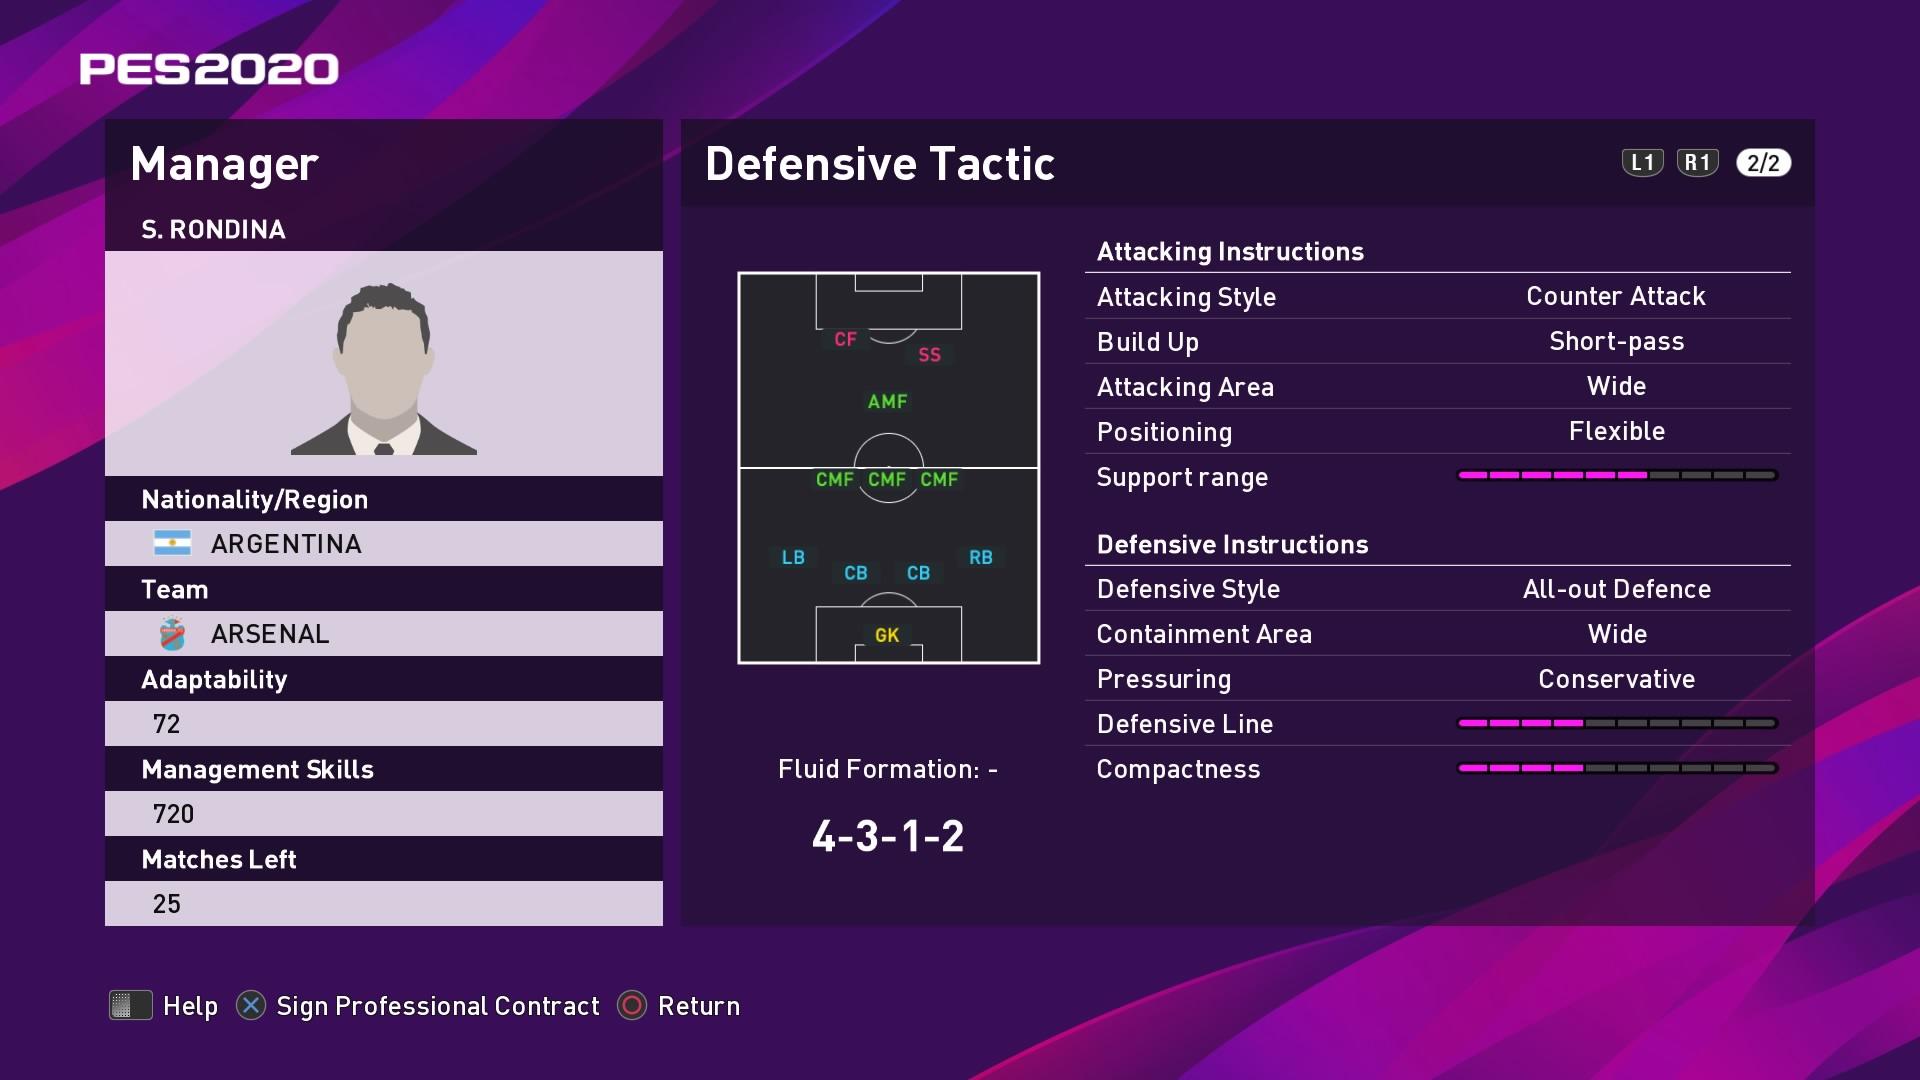 S. Rondina (Sergio Rondina) Defensive Tactic in PES 2020 myClub